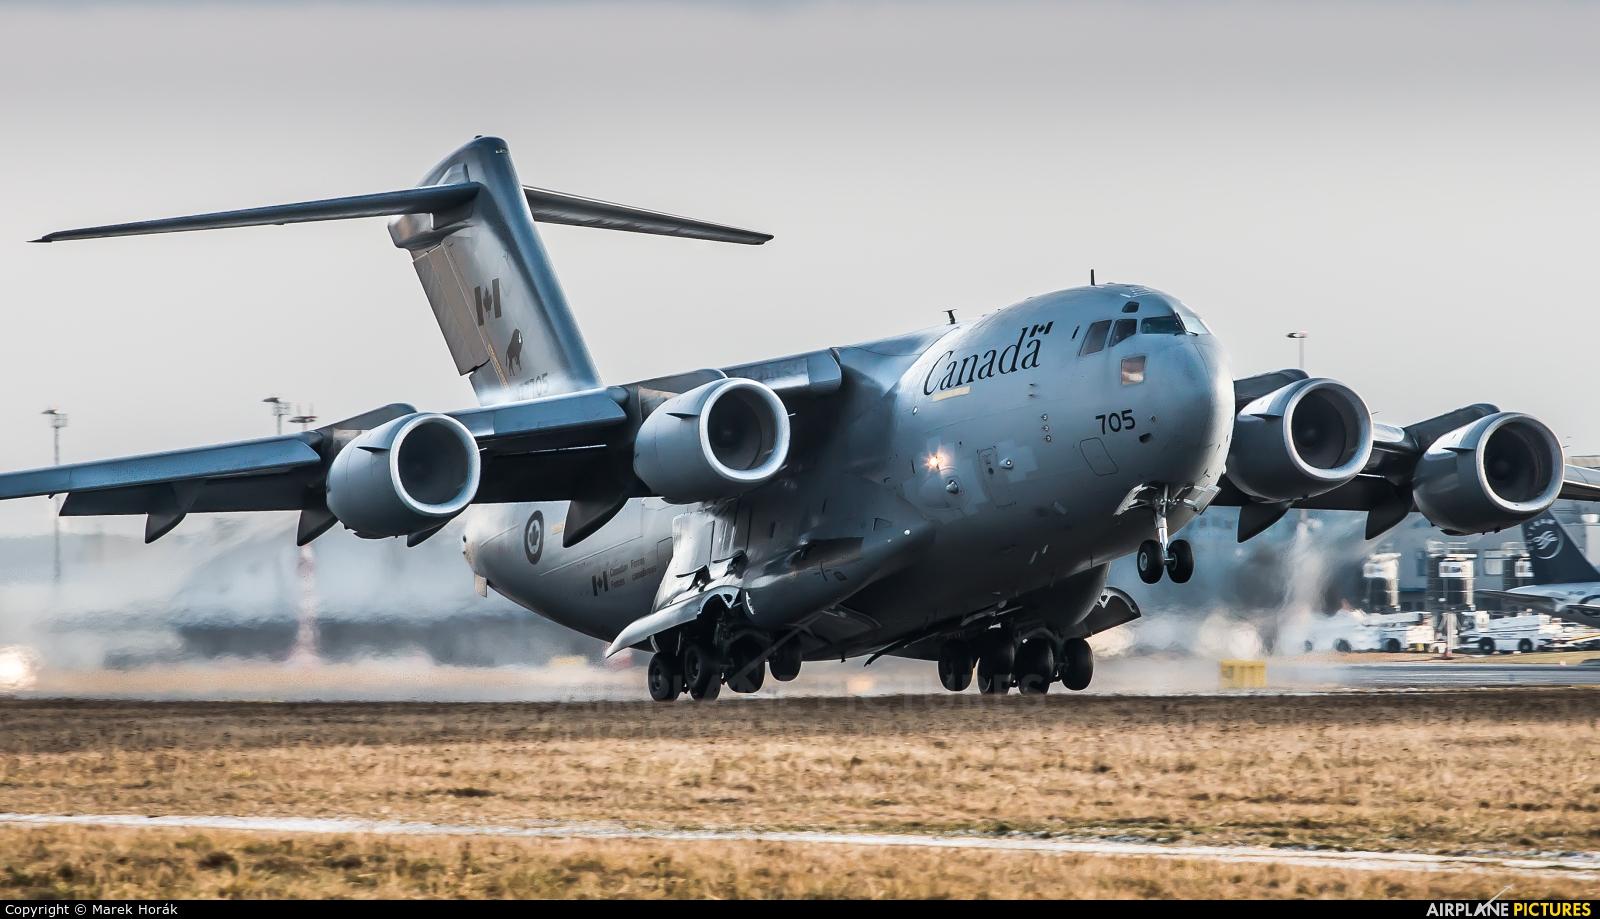 Canada - Air Force 177705 aircraft at Prague - Václav Havel